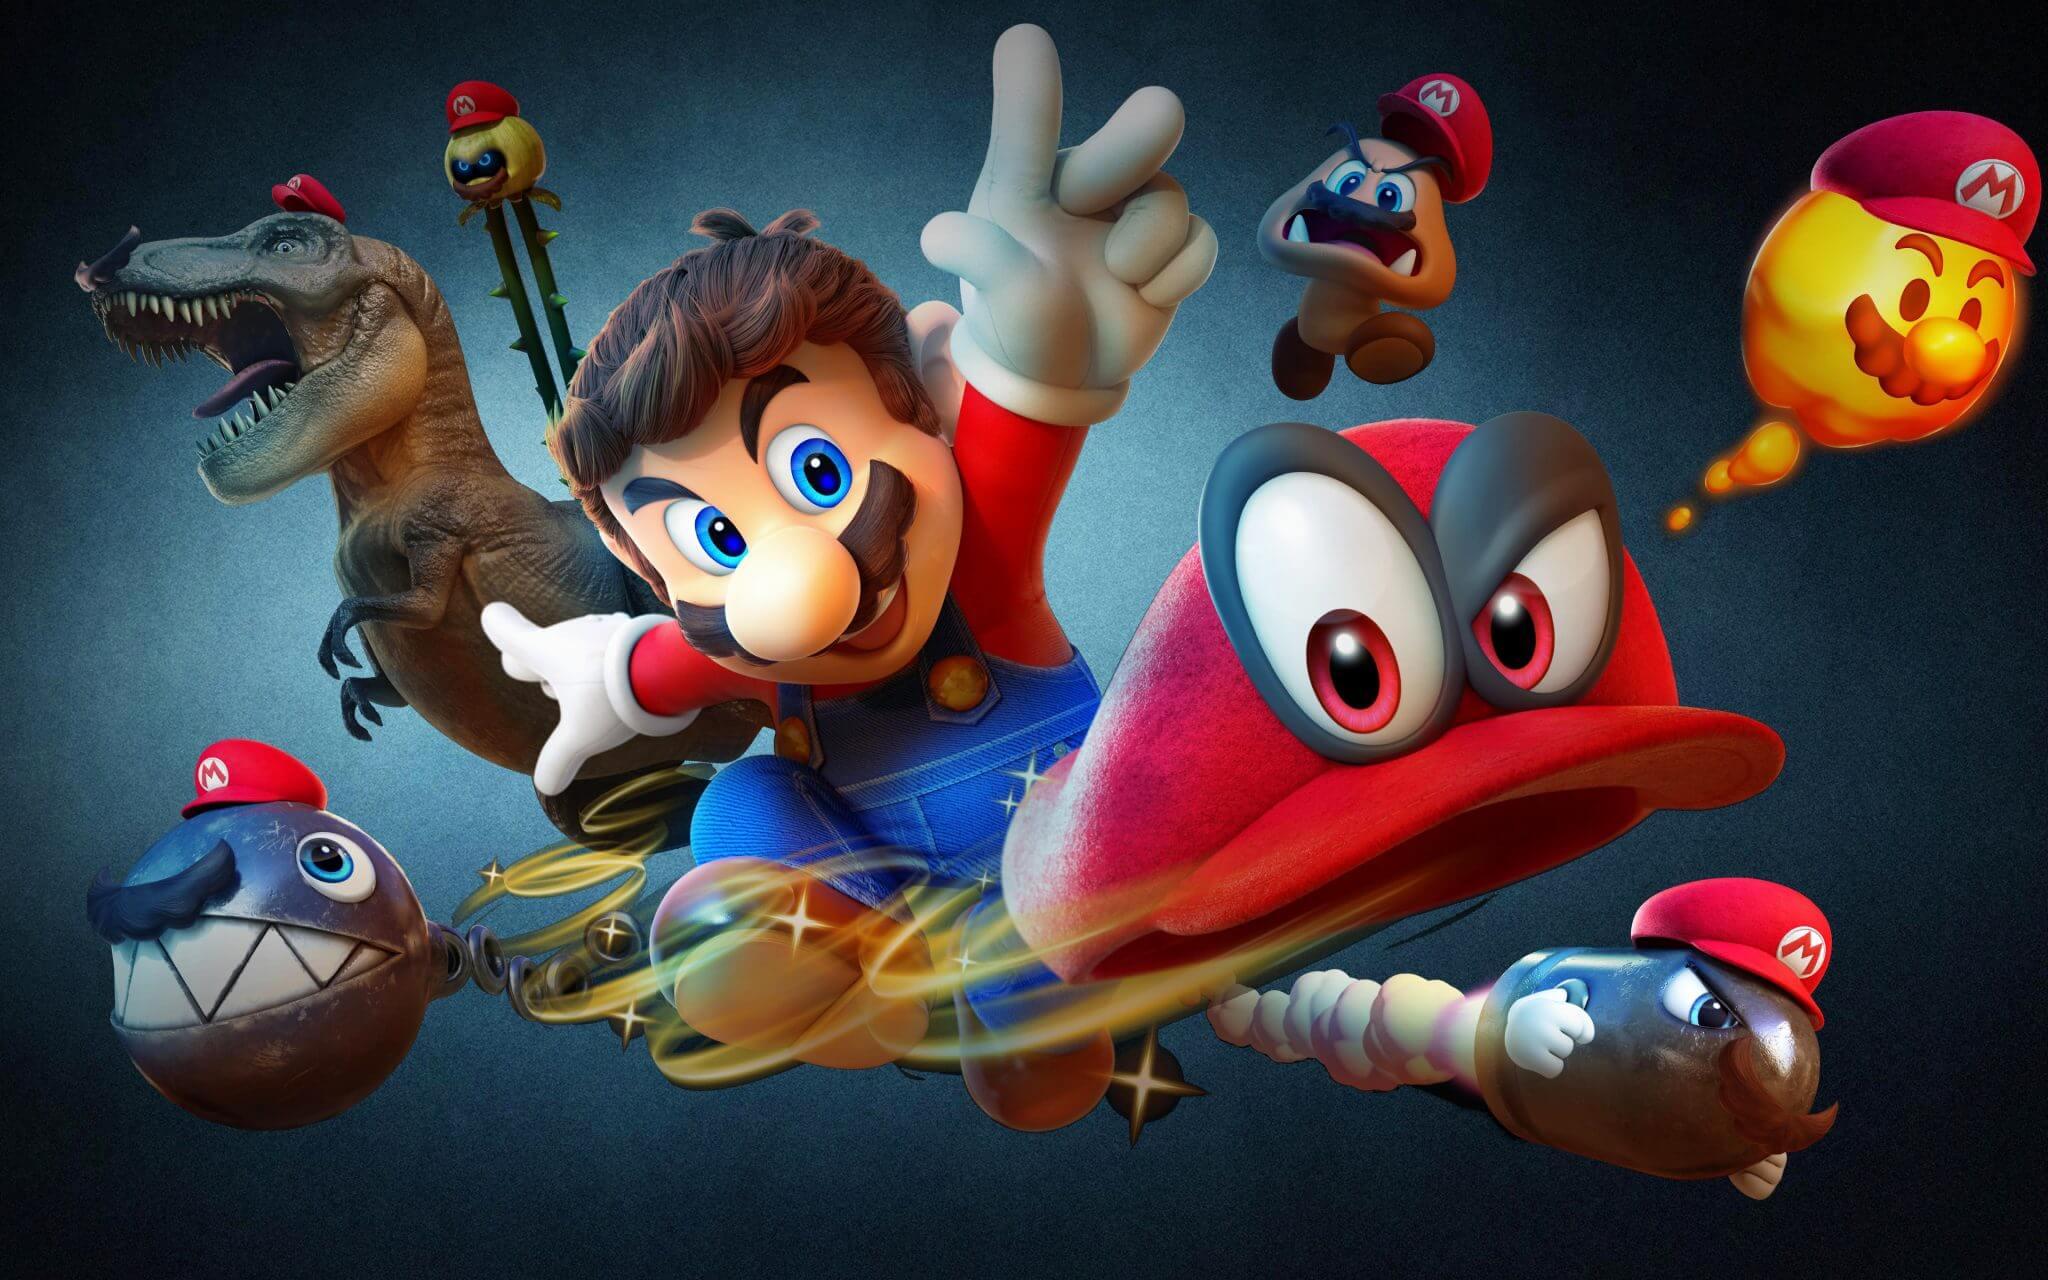 Super Mario Odyssey Wallpaper - Nintendo confirma filme de Mario pelo estúdio de Meu Malvado Favorito